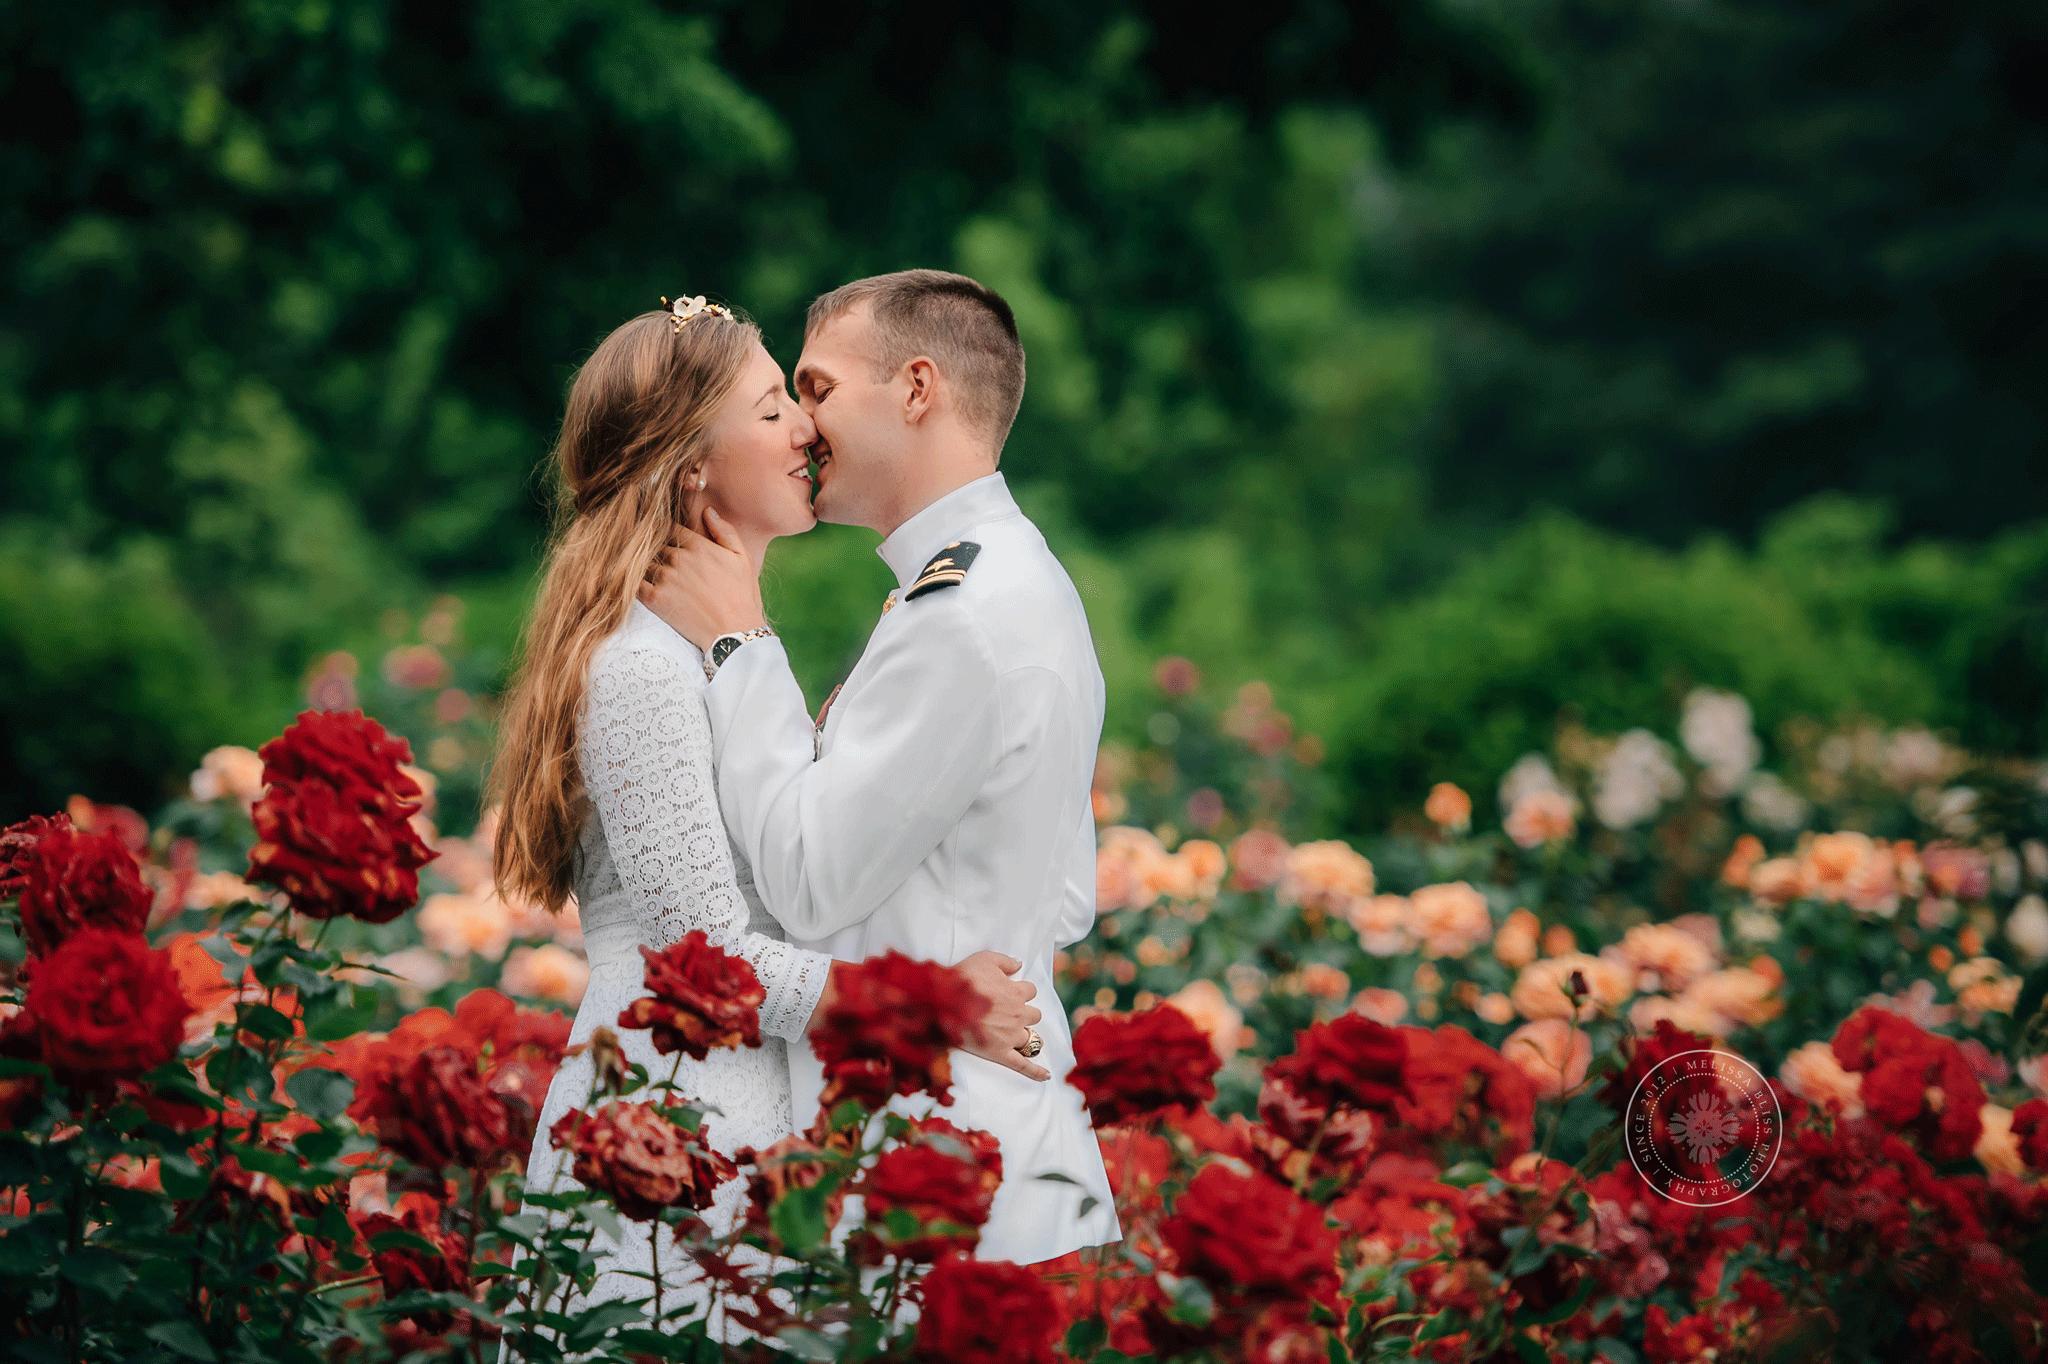 virginia-beach-wedding-photographer-portsmouht-norfolk-wedding-photographer-melissa-bliss-photography-norfolk-botanical-gardens-roses.png